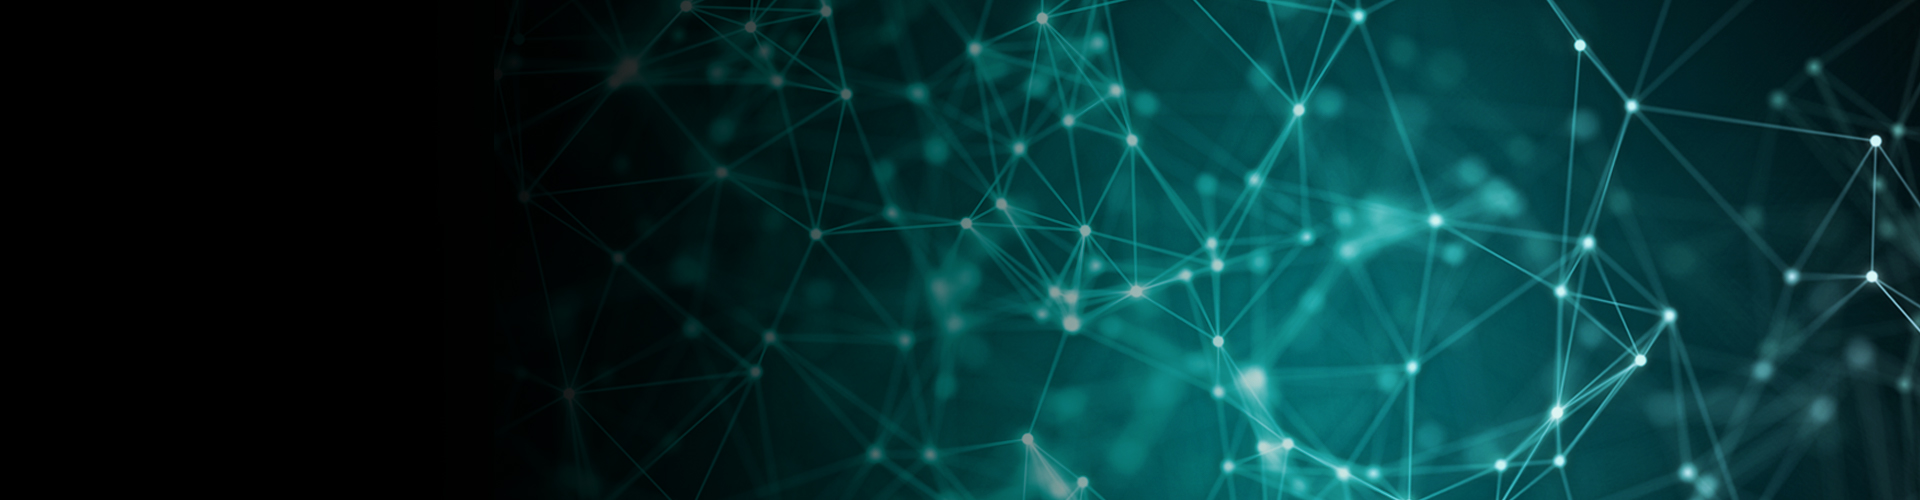 Artificial neuron intelligence network